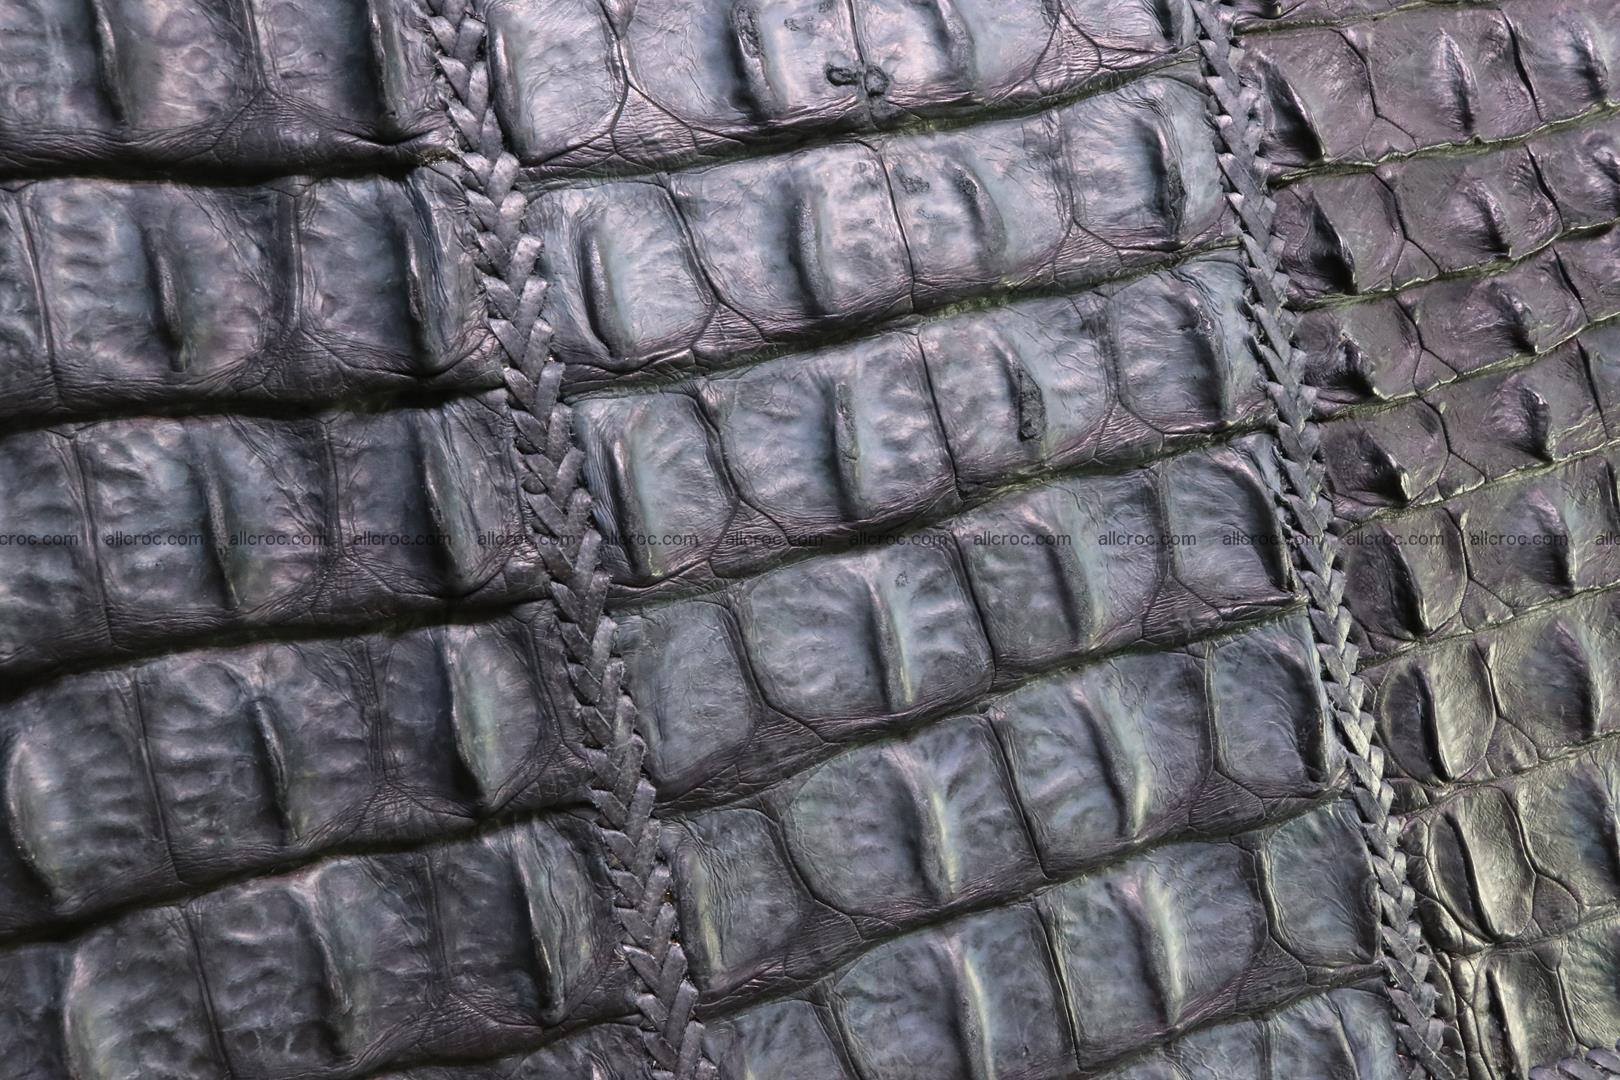 Crocodile skin shoulder bag with braided edges 146 Foto 14